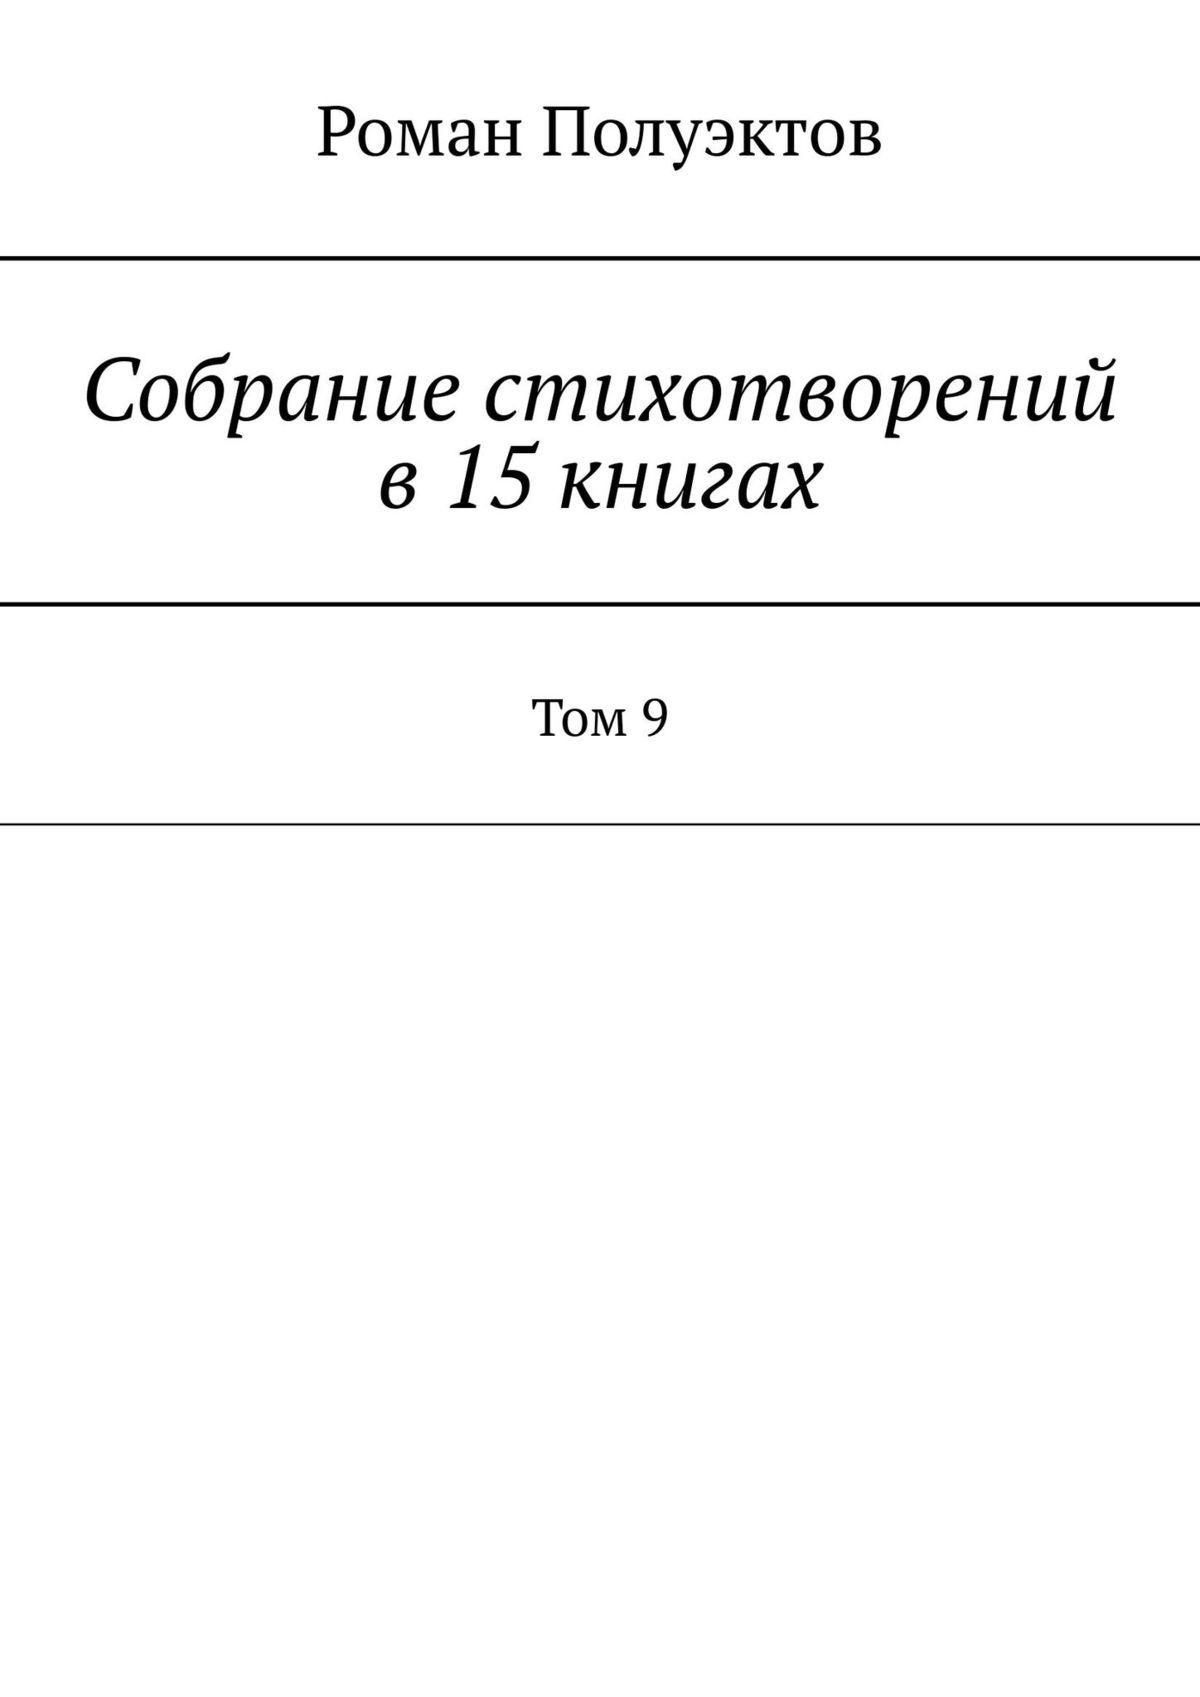 Роман Полуэктов Собраниестихотворений в15книгах. Том9 аппиано алессандра завтра все наладится роман